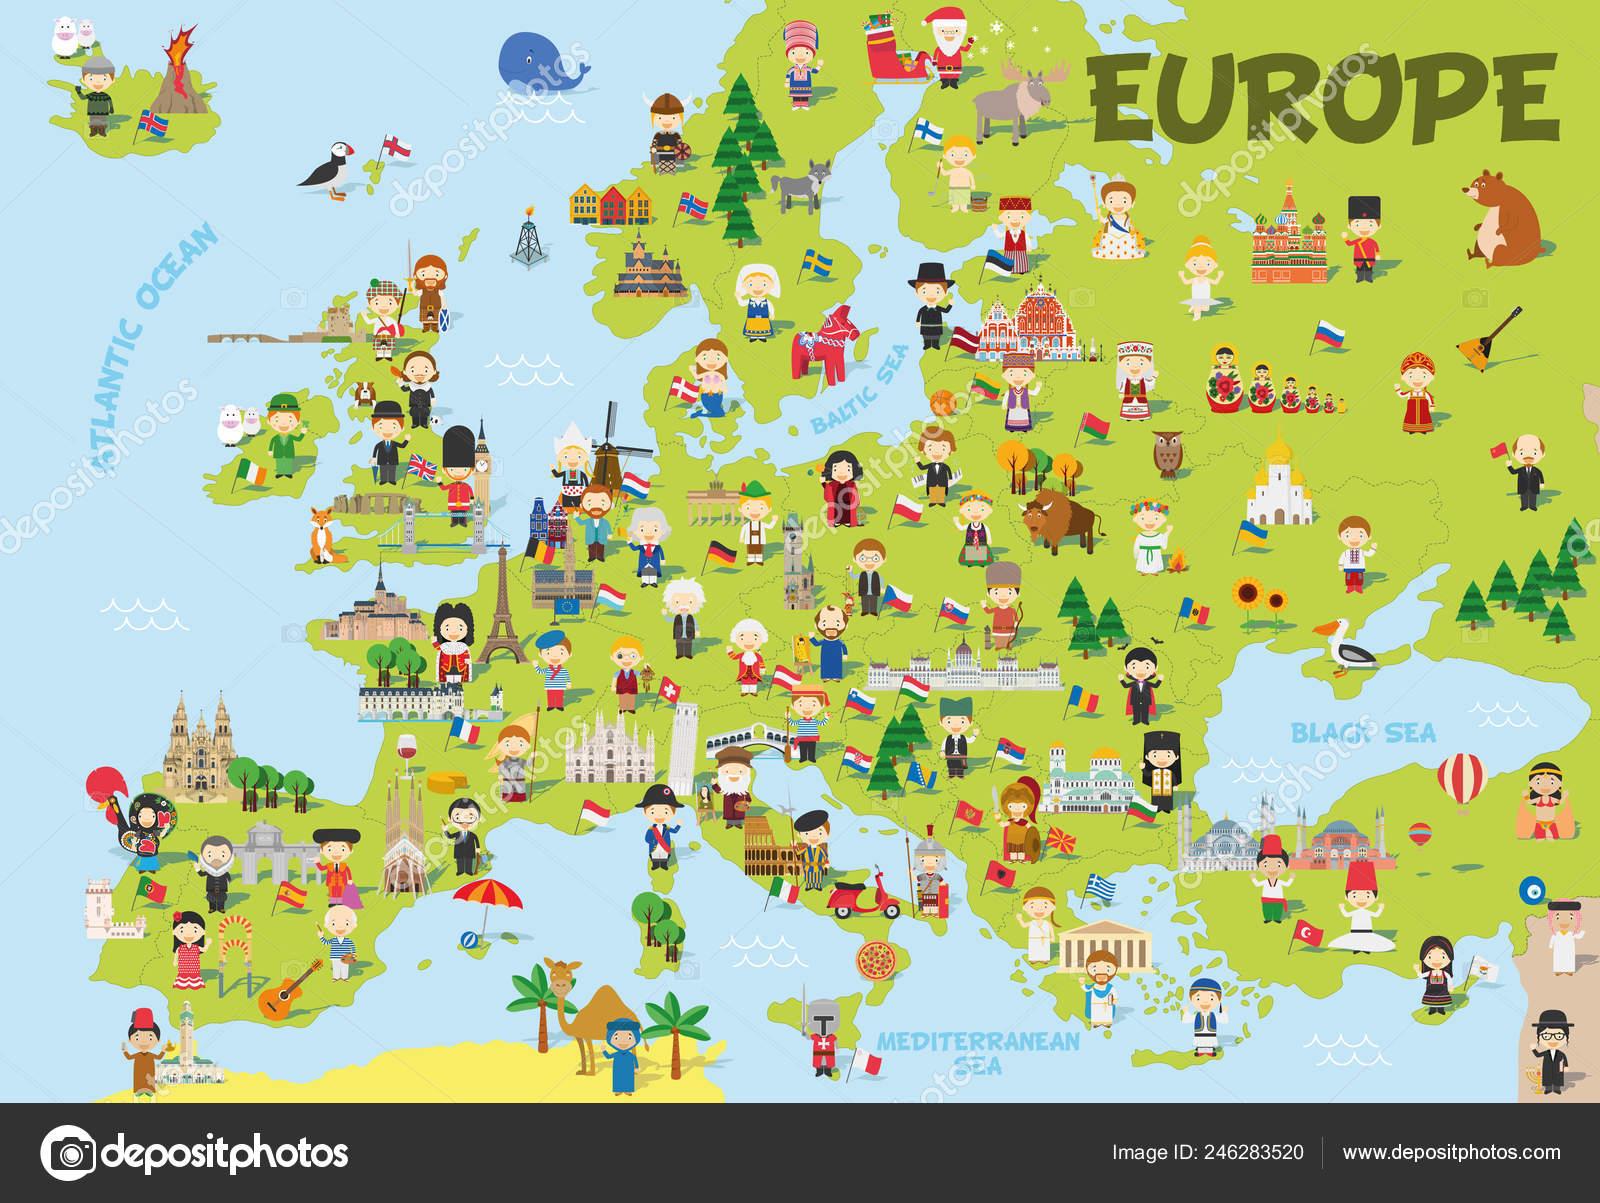 Dibujos De NiÑos Por Nacionalidades: Mapa De Divertidos Dibujos Animados De Europa Con Niños